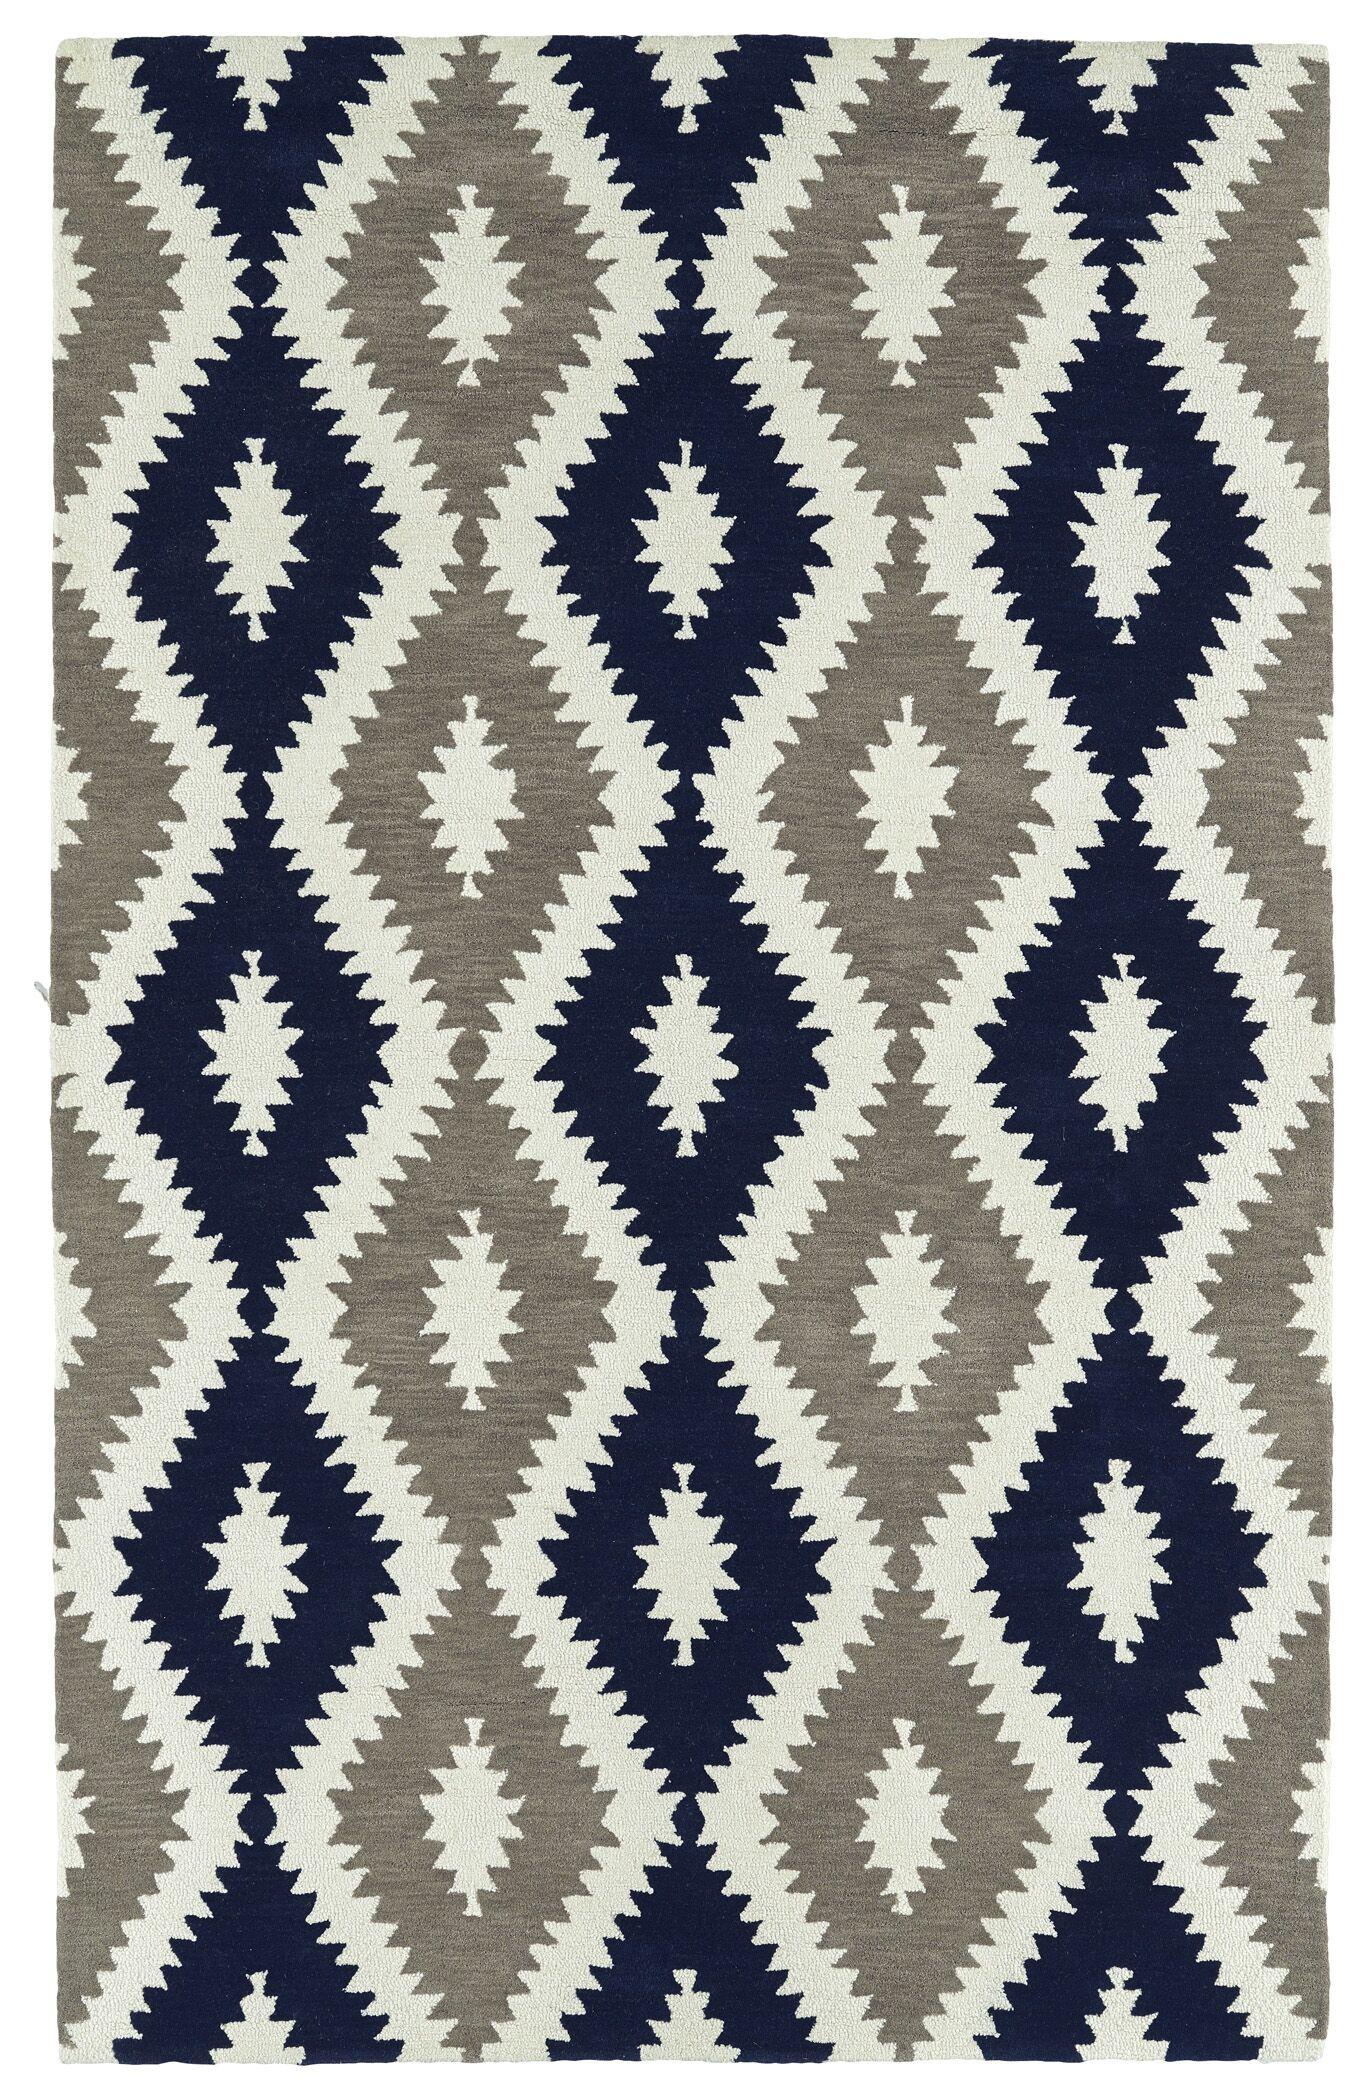 Hinton Charterhouse Hand-Tufted Navy/Ivory Area Rug Rug Size: Rectangle 9' x 12'